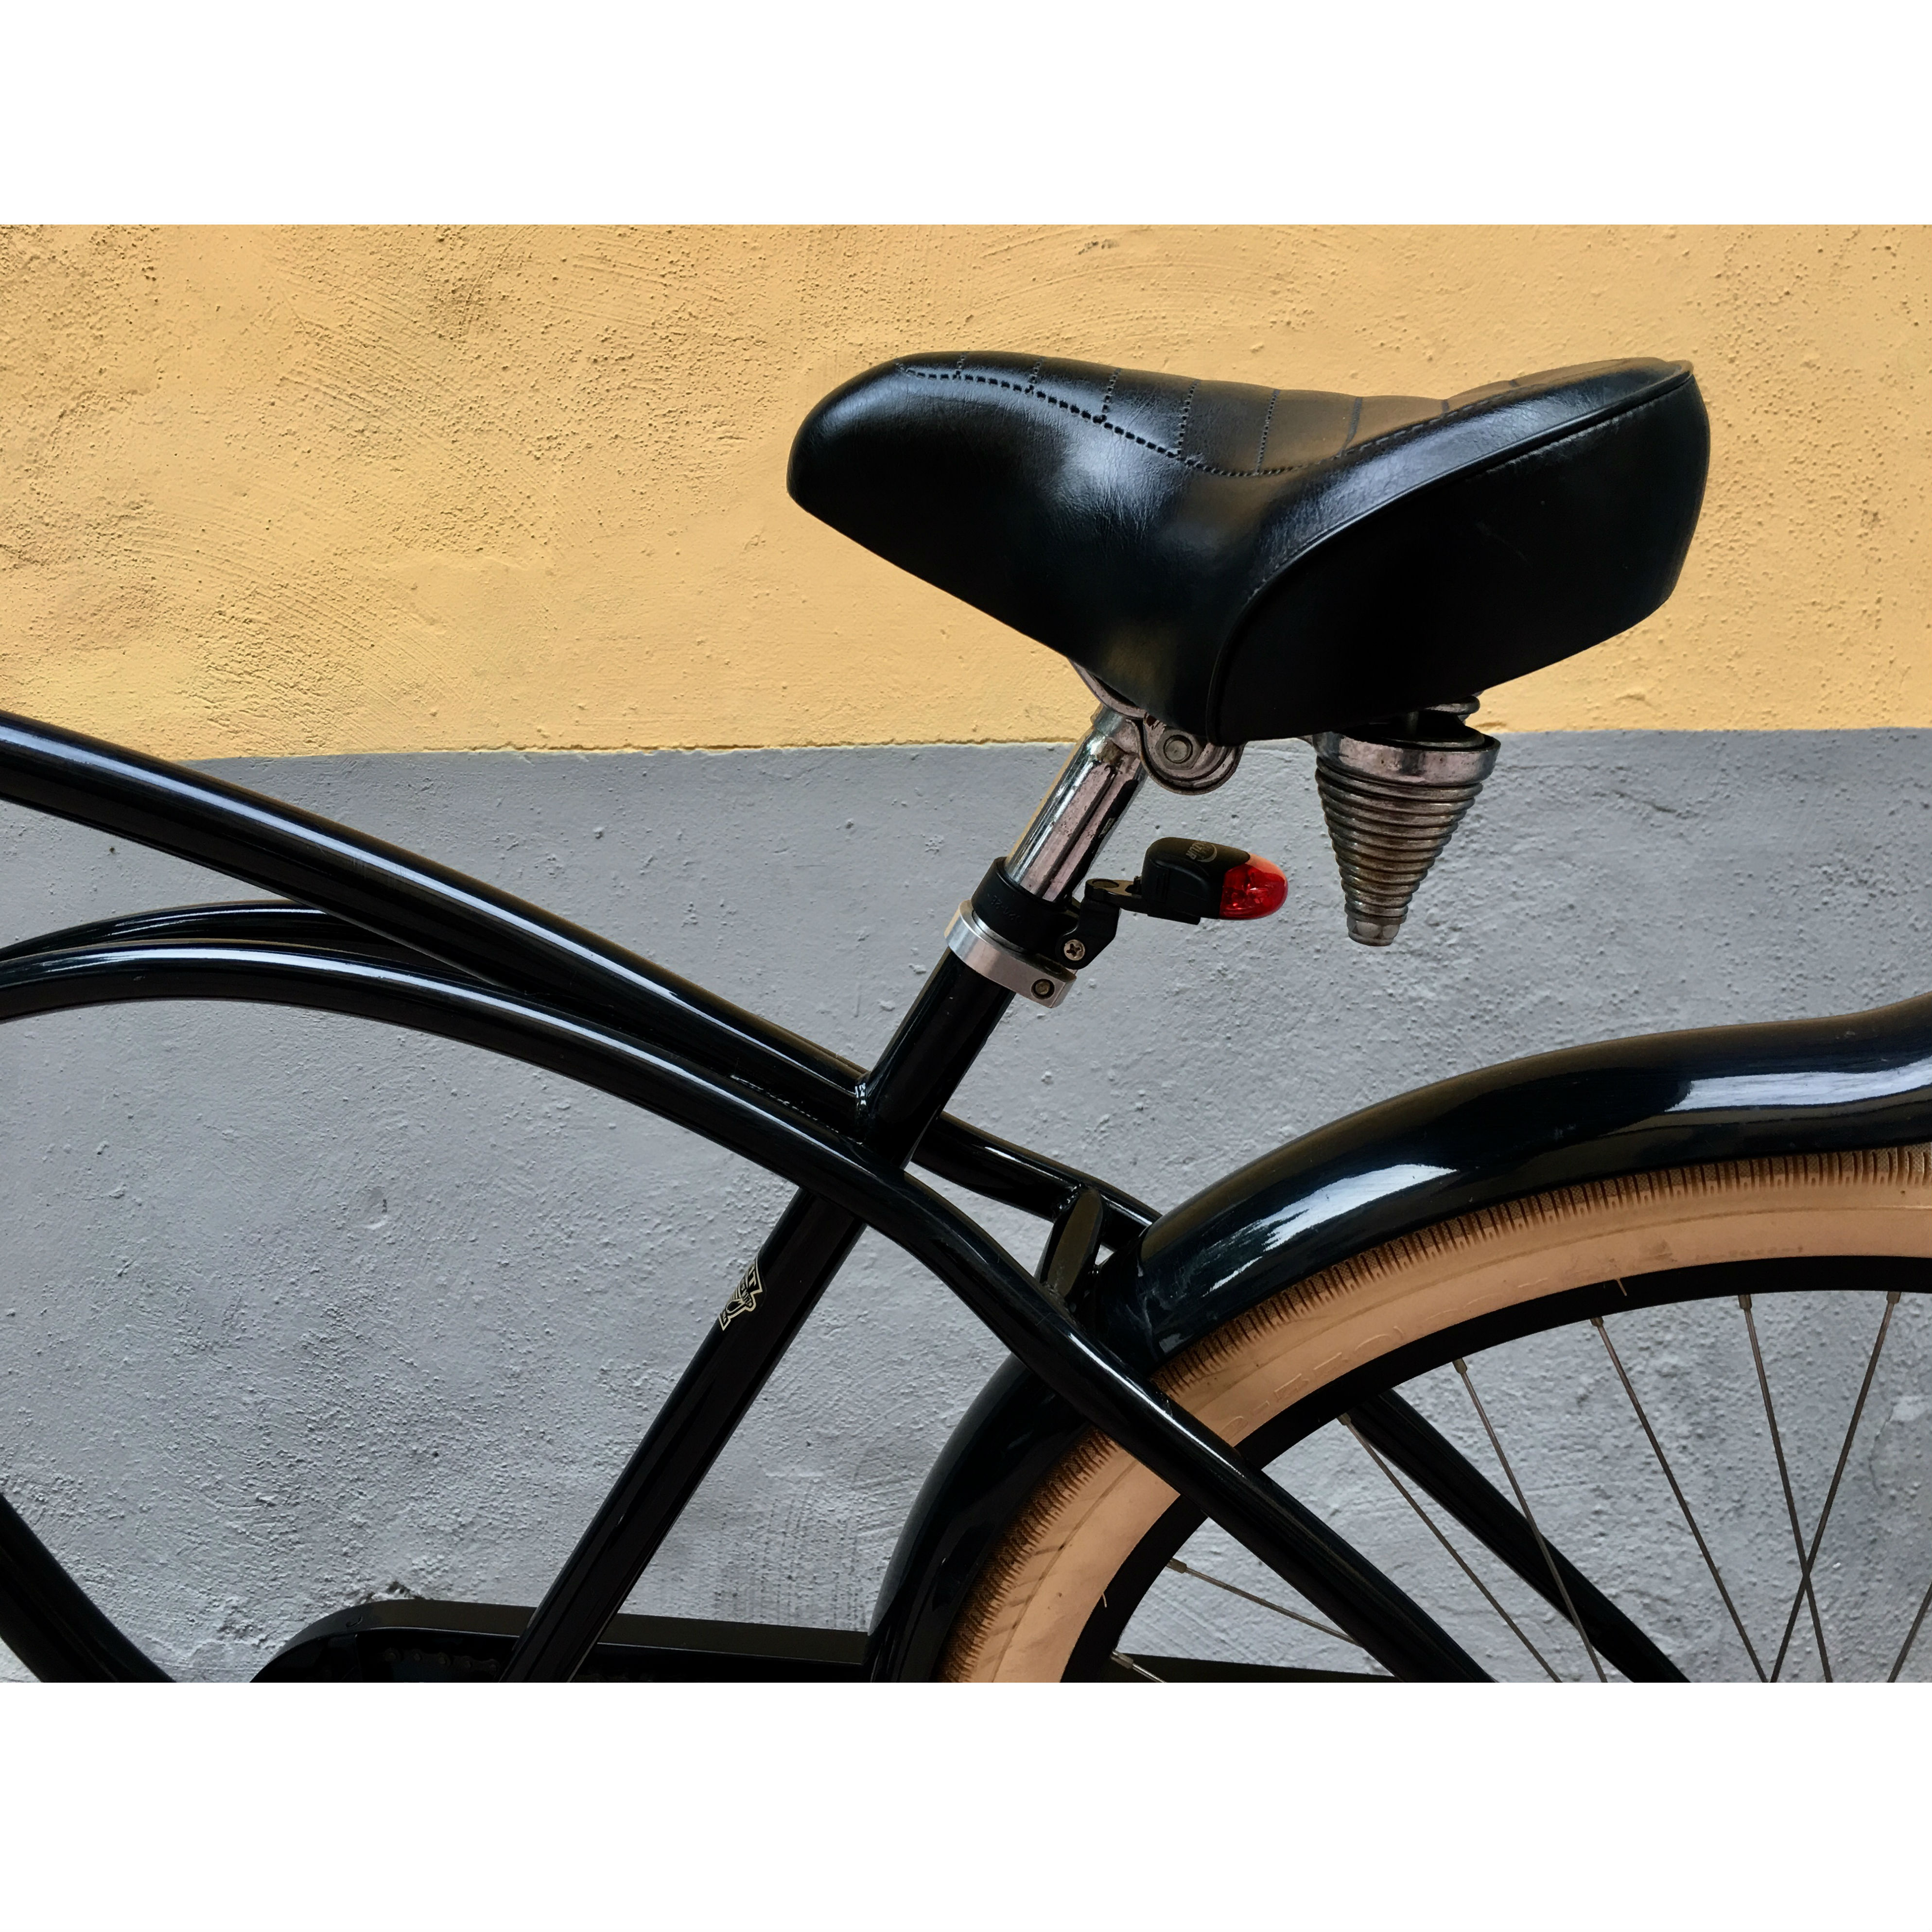 Bicicletta Americana Biciclette Vintage Bogys50s